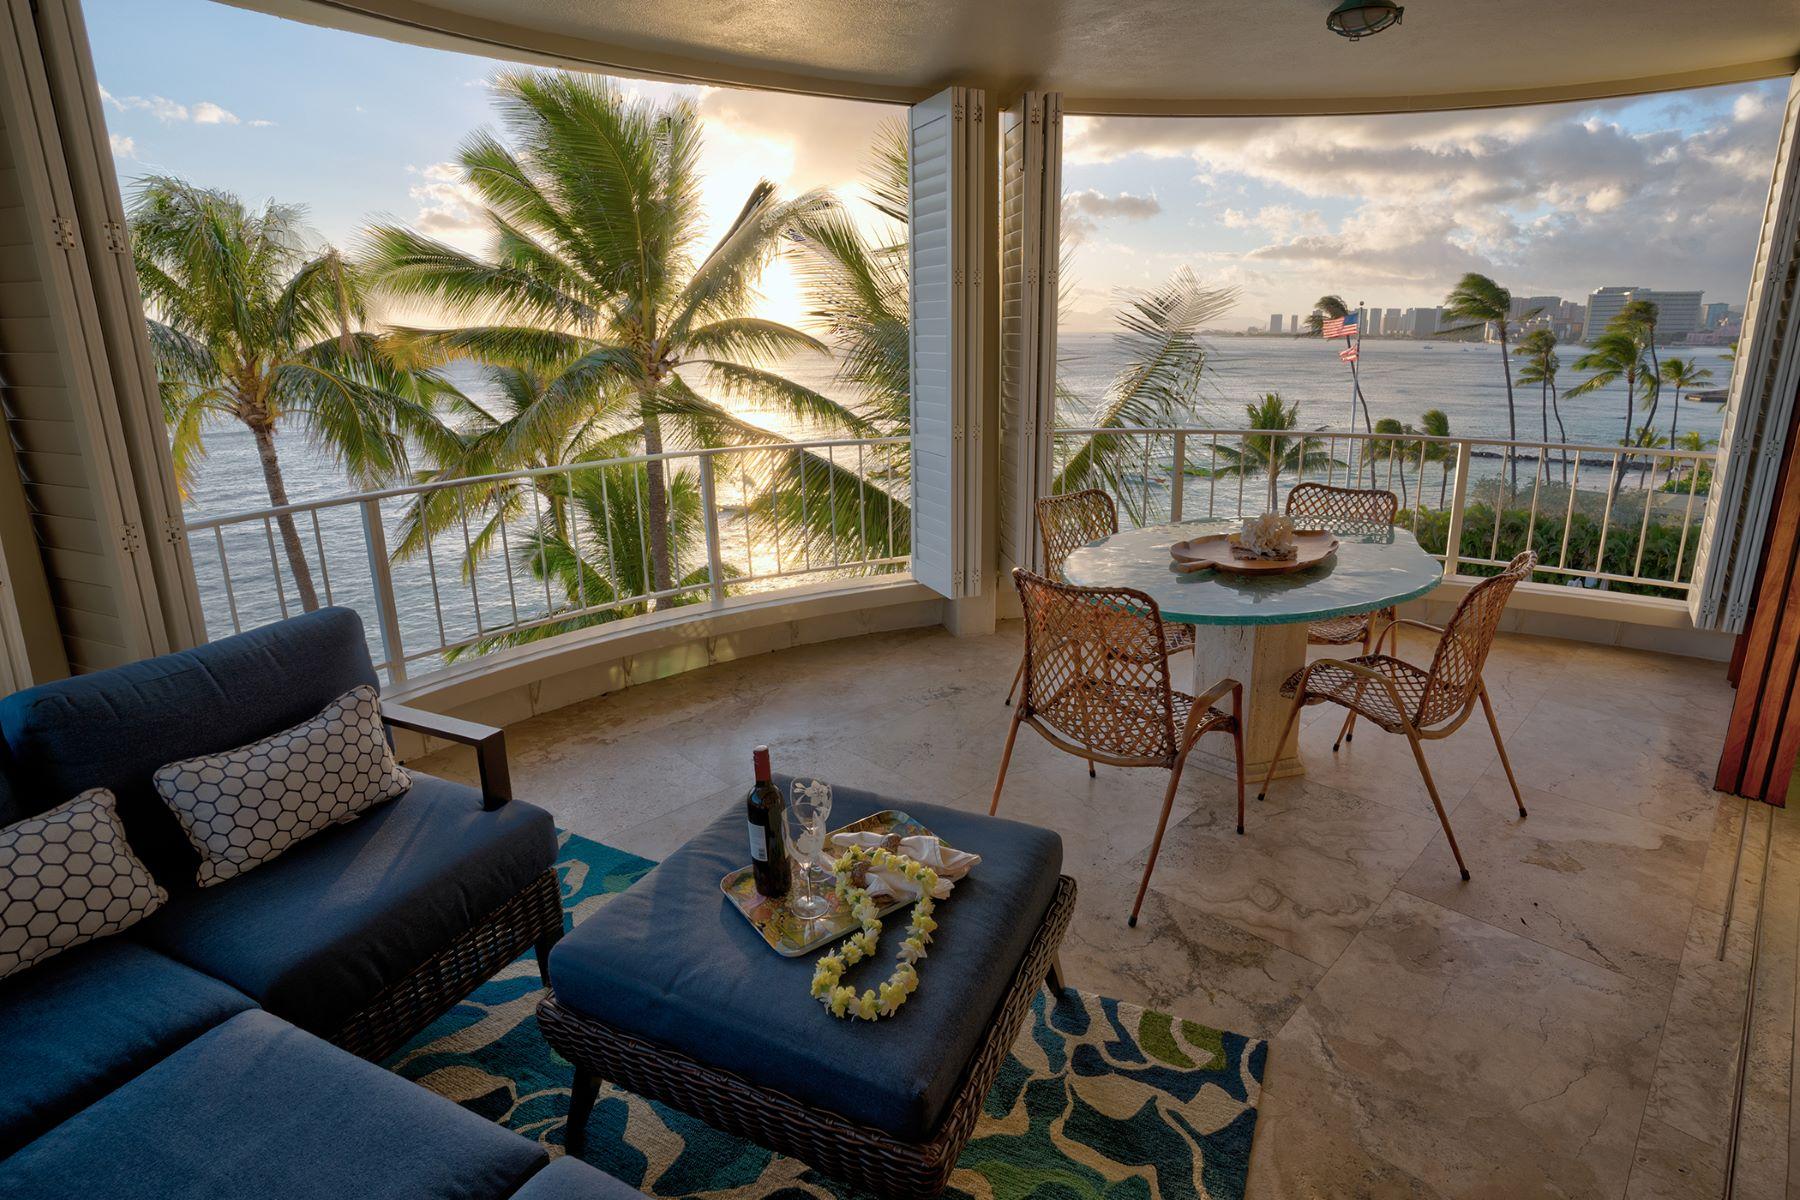 Condominiums for Sale at Castle Surf Apartments Condo, Diamond Head, Ocean Views, Sunset Views 2937 Kalakaua Avenue #61 Honolulu, Hawaii 96815 United States